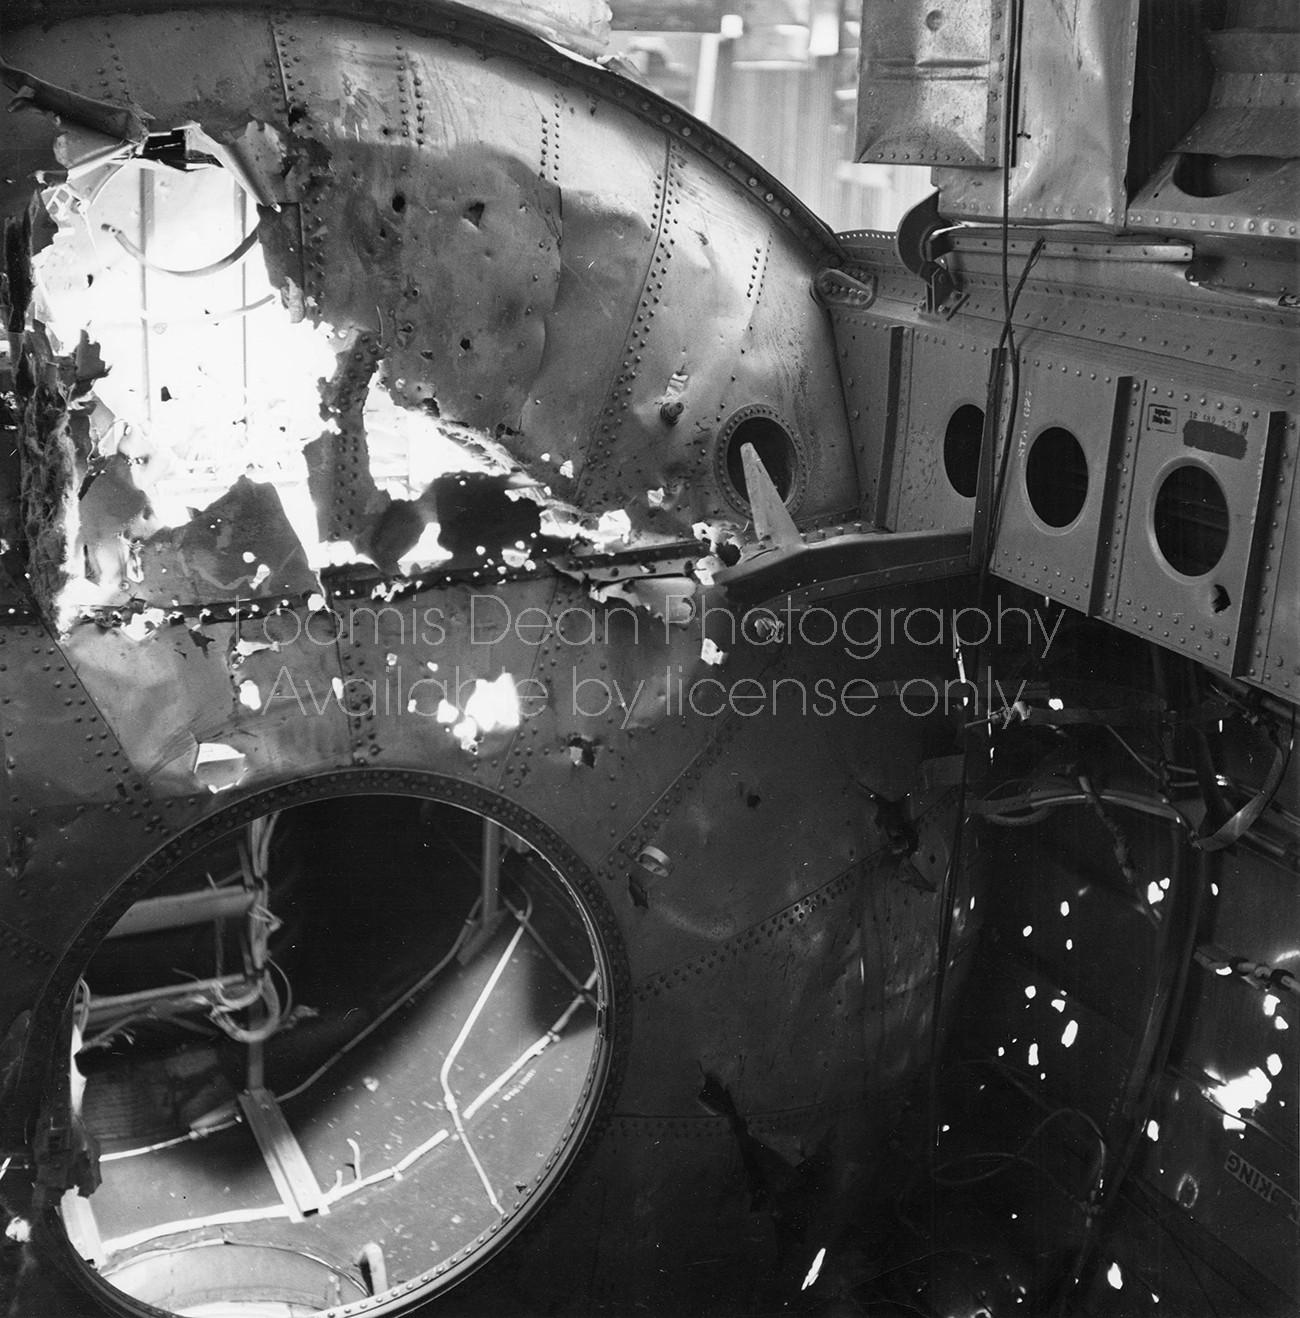 U.S. AIR FORCE B29 BOMBER SHRAPNEL DAMAGE 099